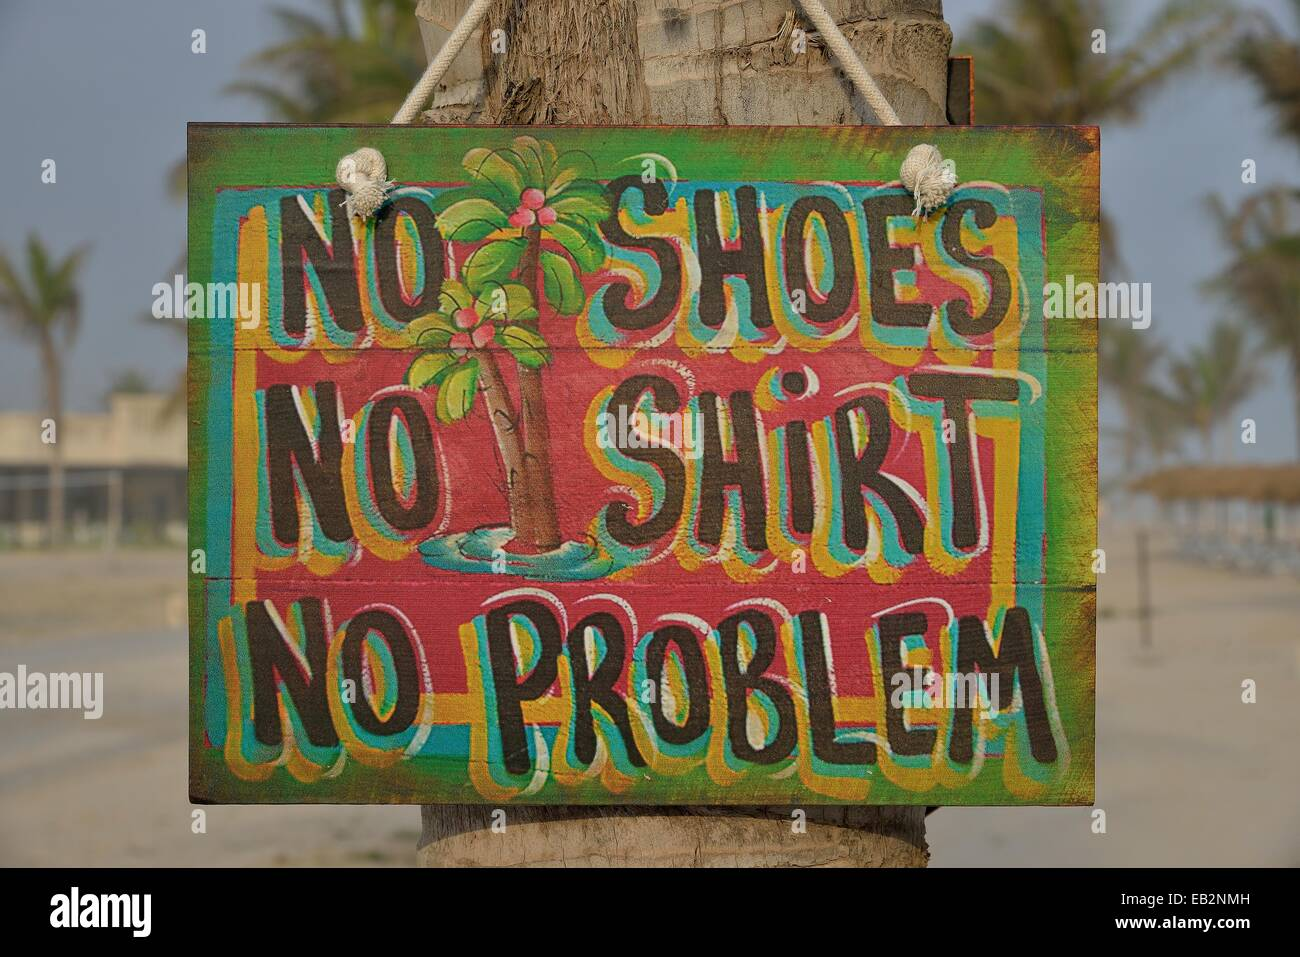 No Shoes Sign Imágenes De Stock   No Shoes Sign Fotos De Stock - Alamy 8047164d664c